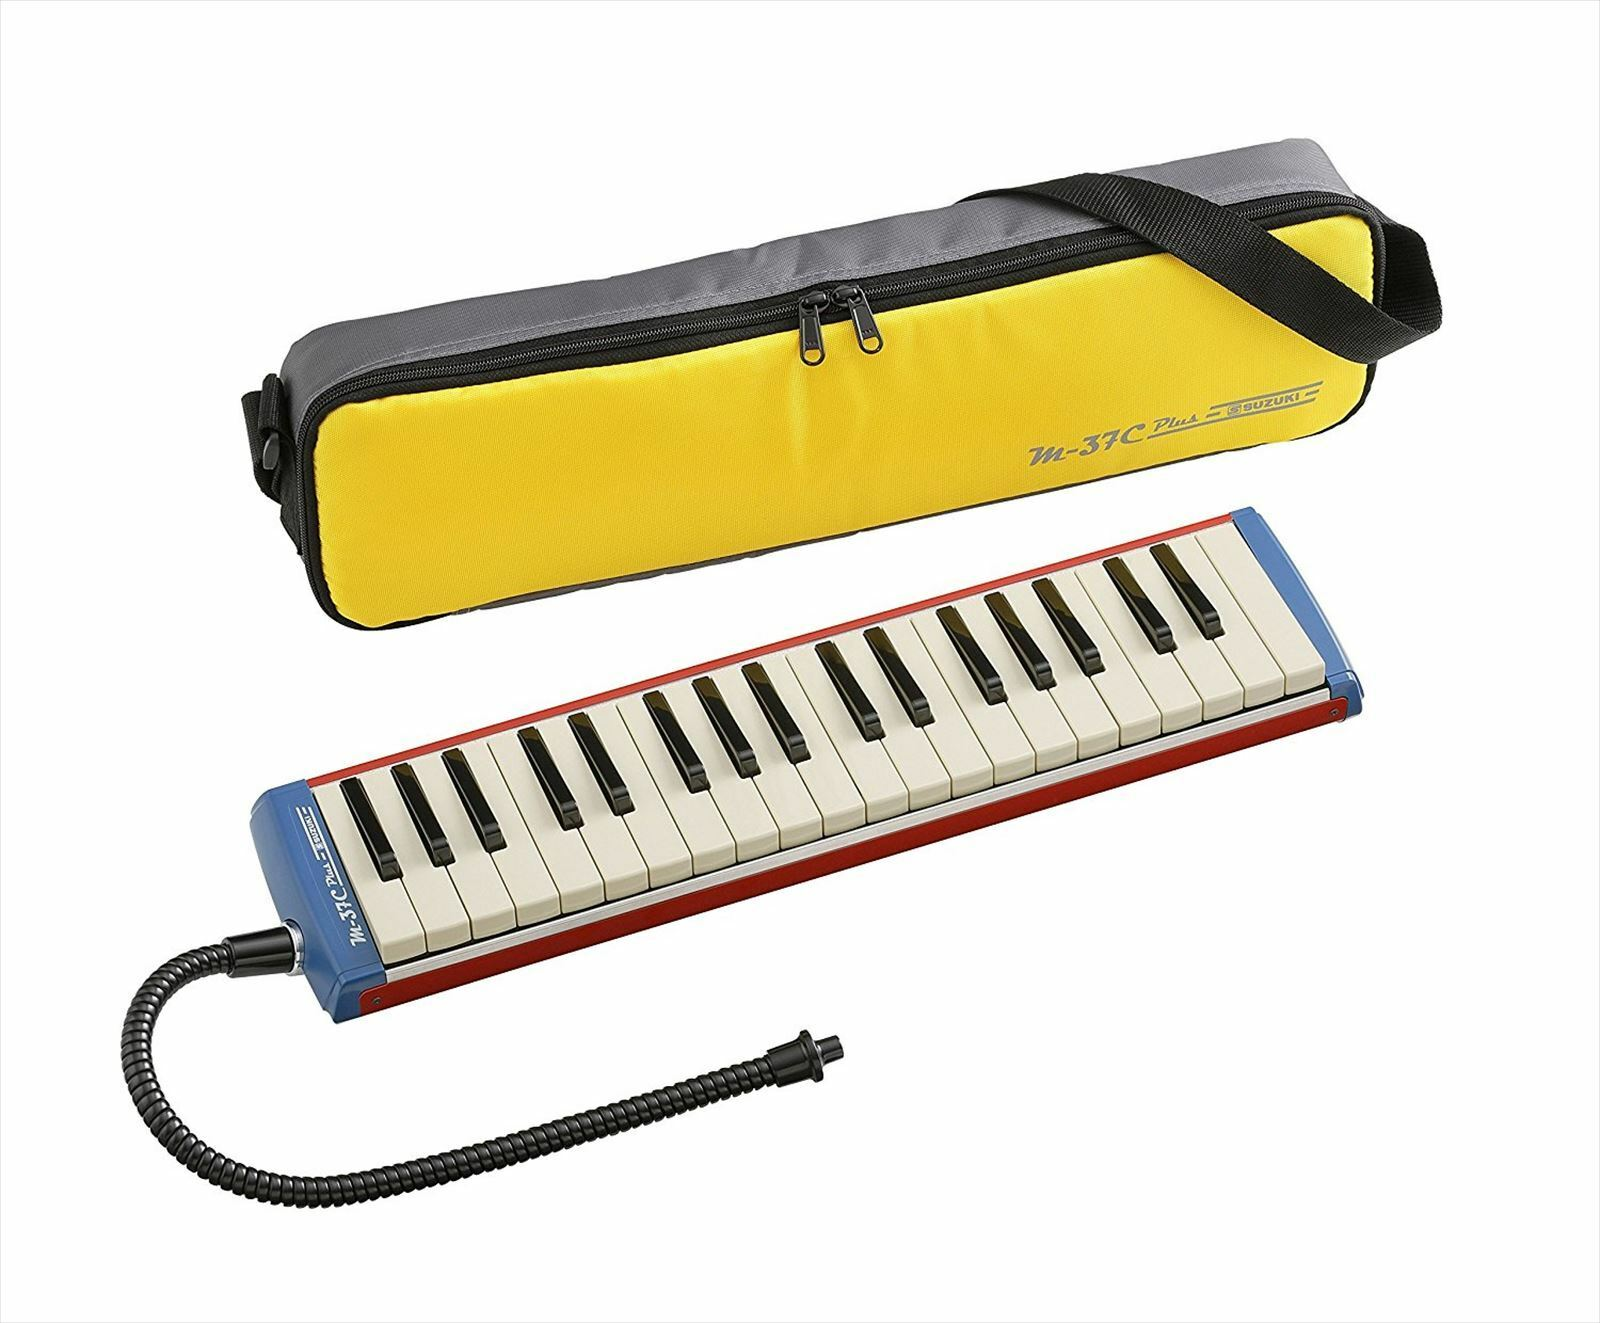 Armónica Melodion Suzuki teclado  Alt M-37C Plus 37key 37key 37key Melodica F S de Japón a04a14